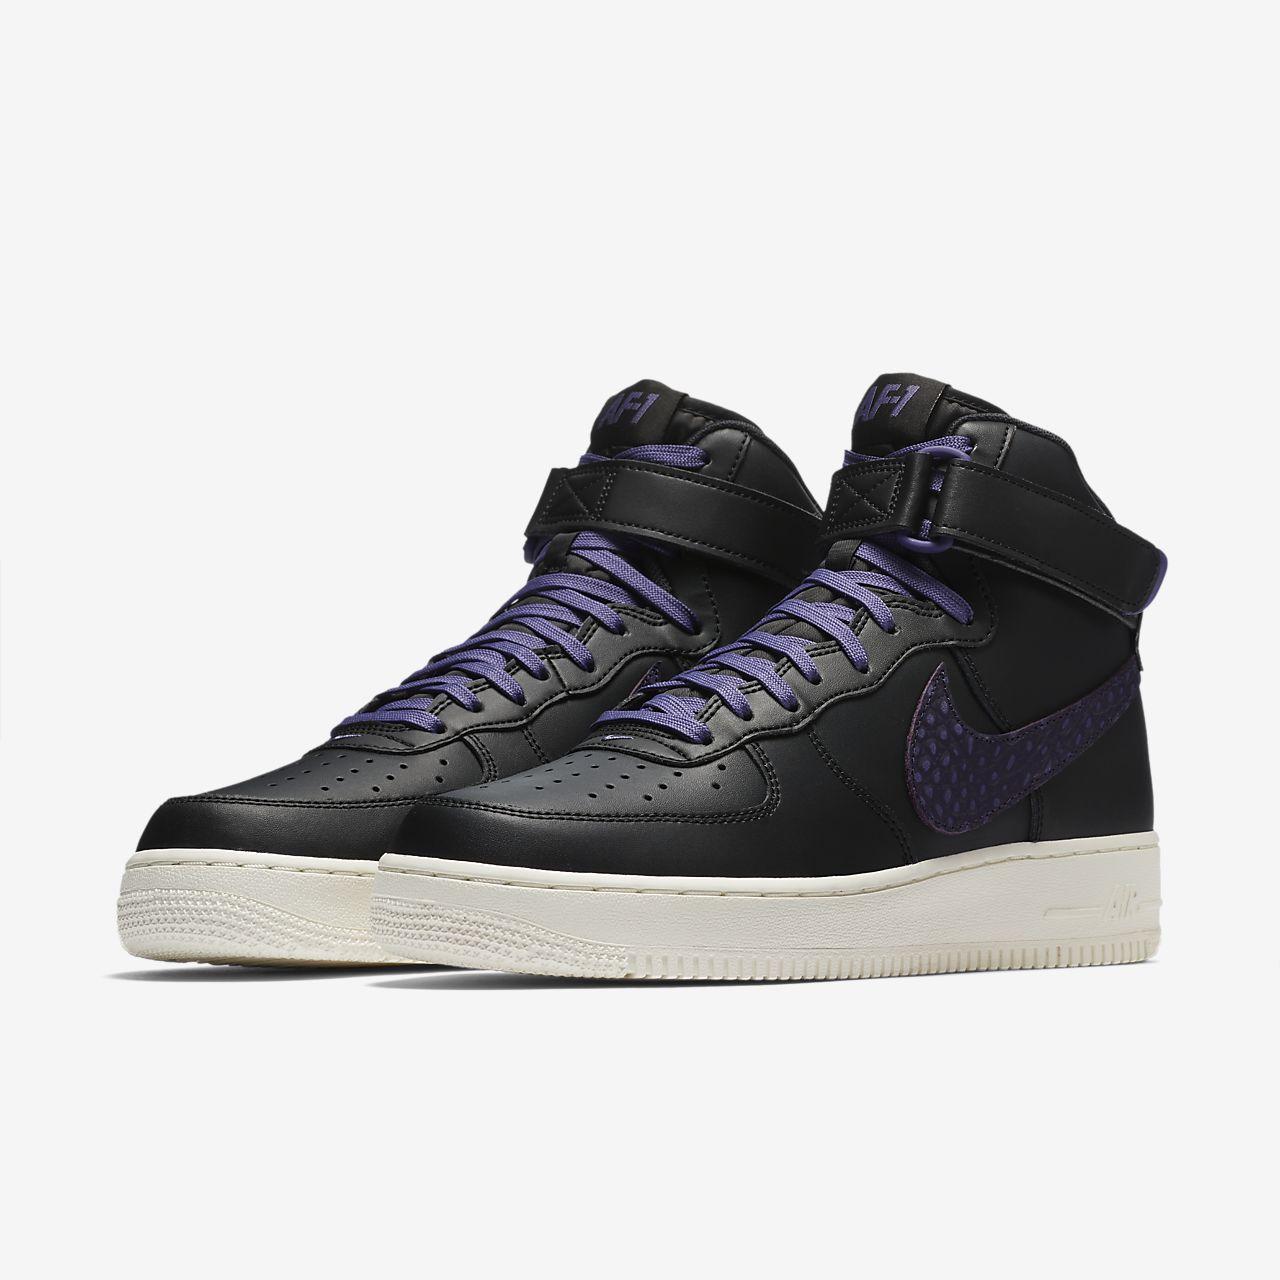 nike air force 1 07 high lv8 mens shoe